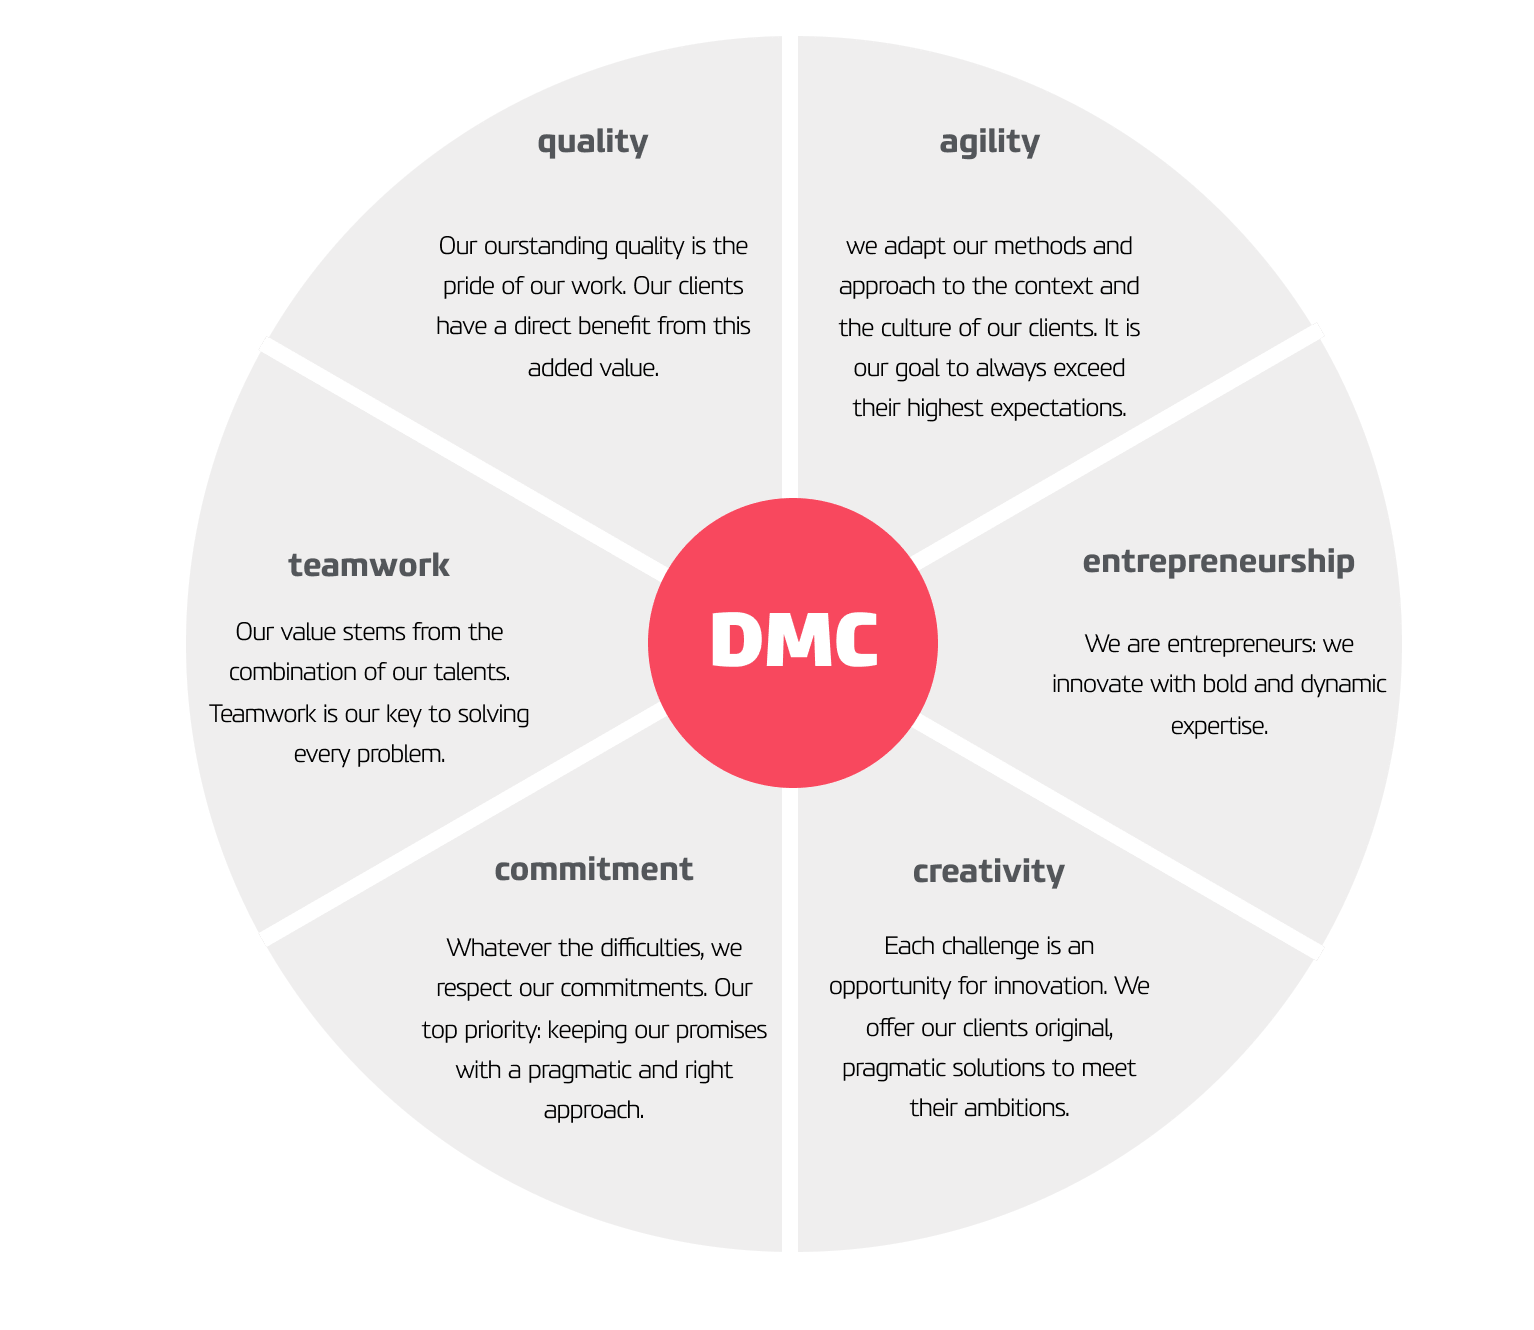 DMC Values: agility, quality, creativity, commitment, entrepreneurship, teamwork